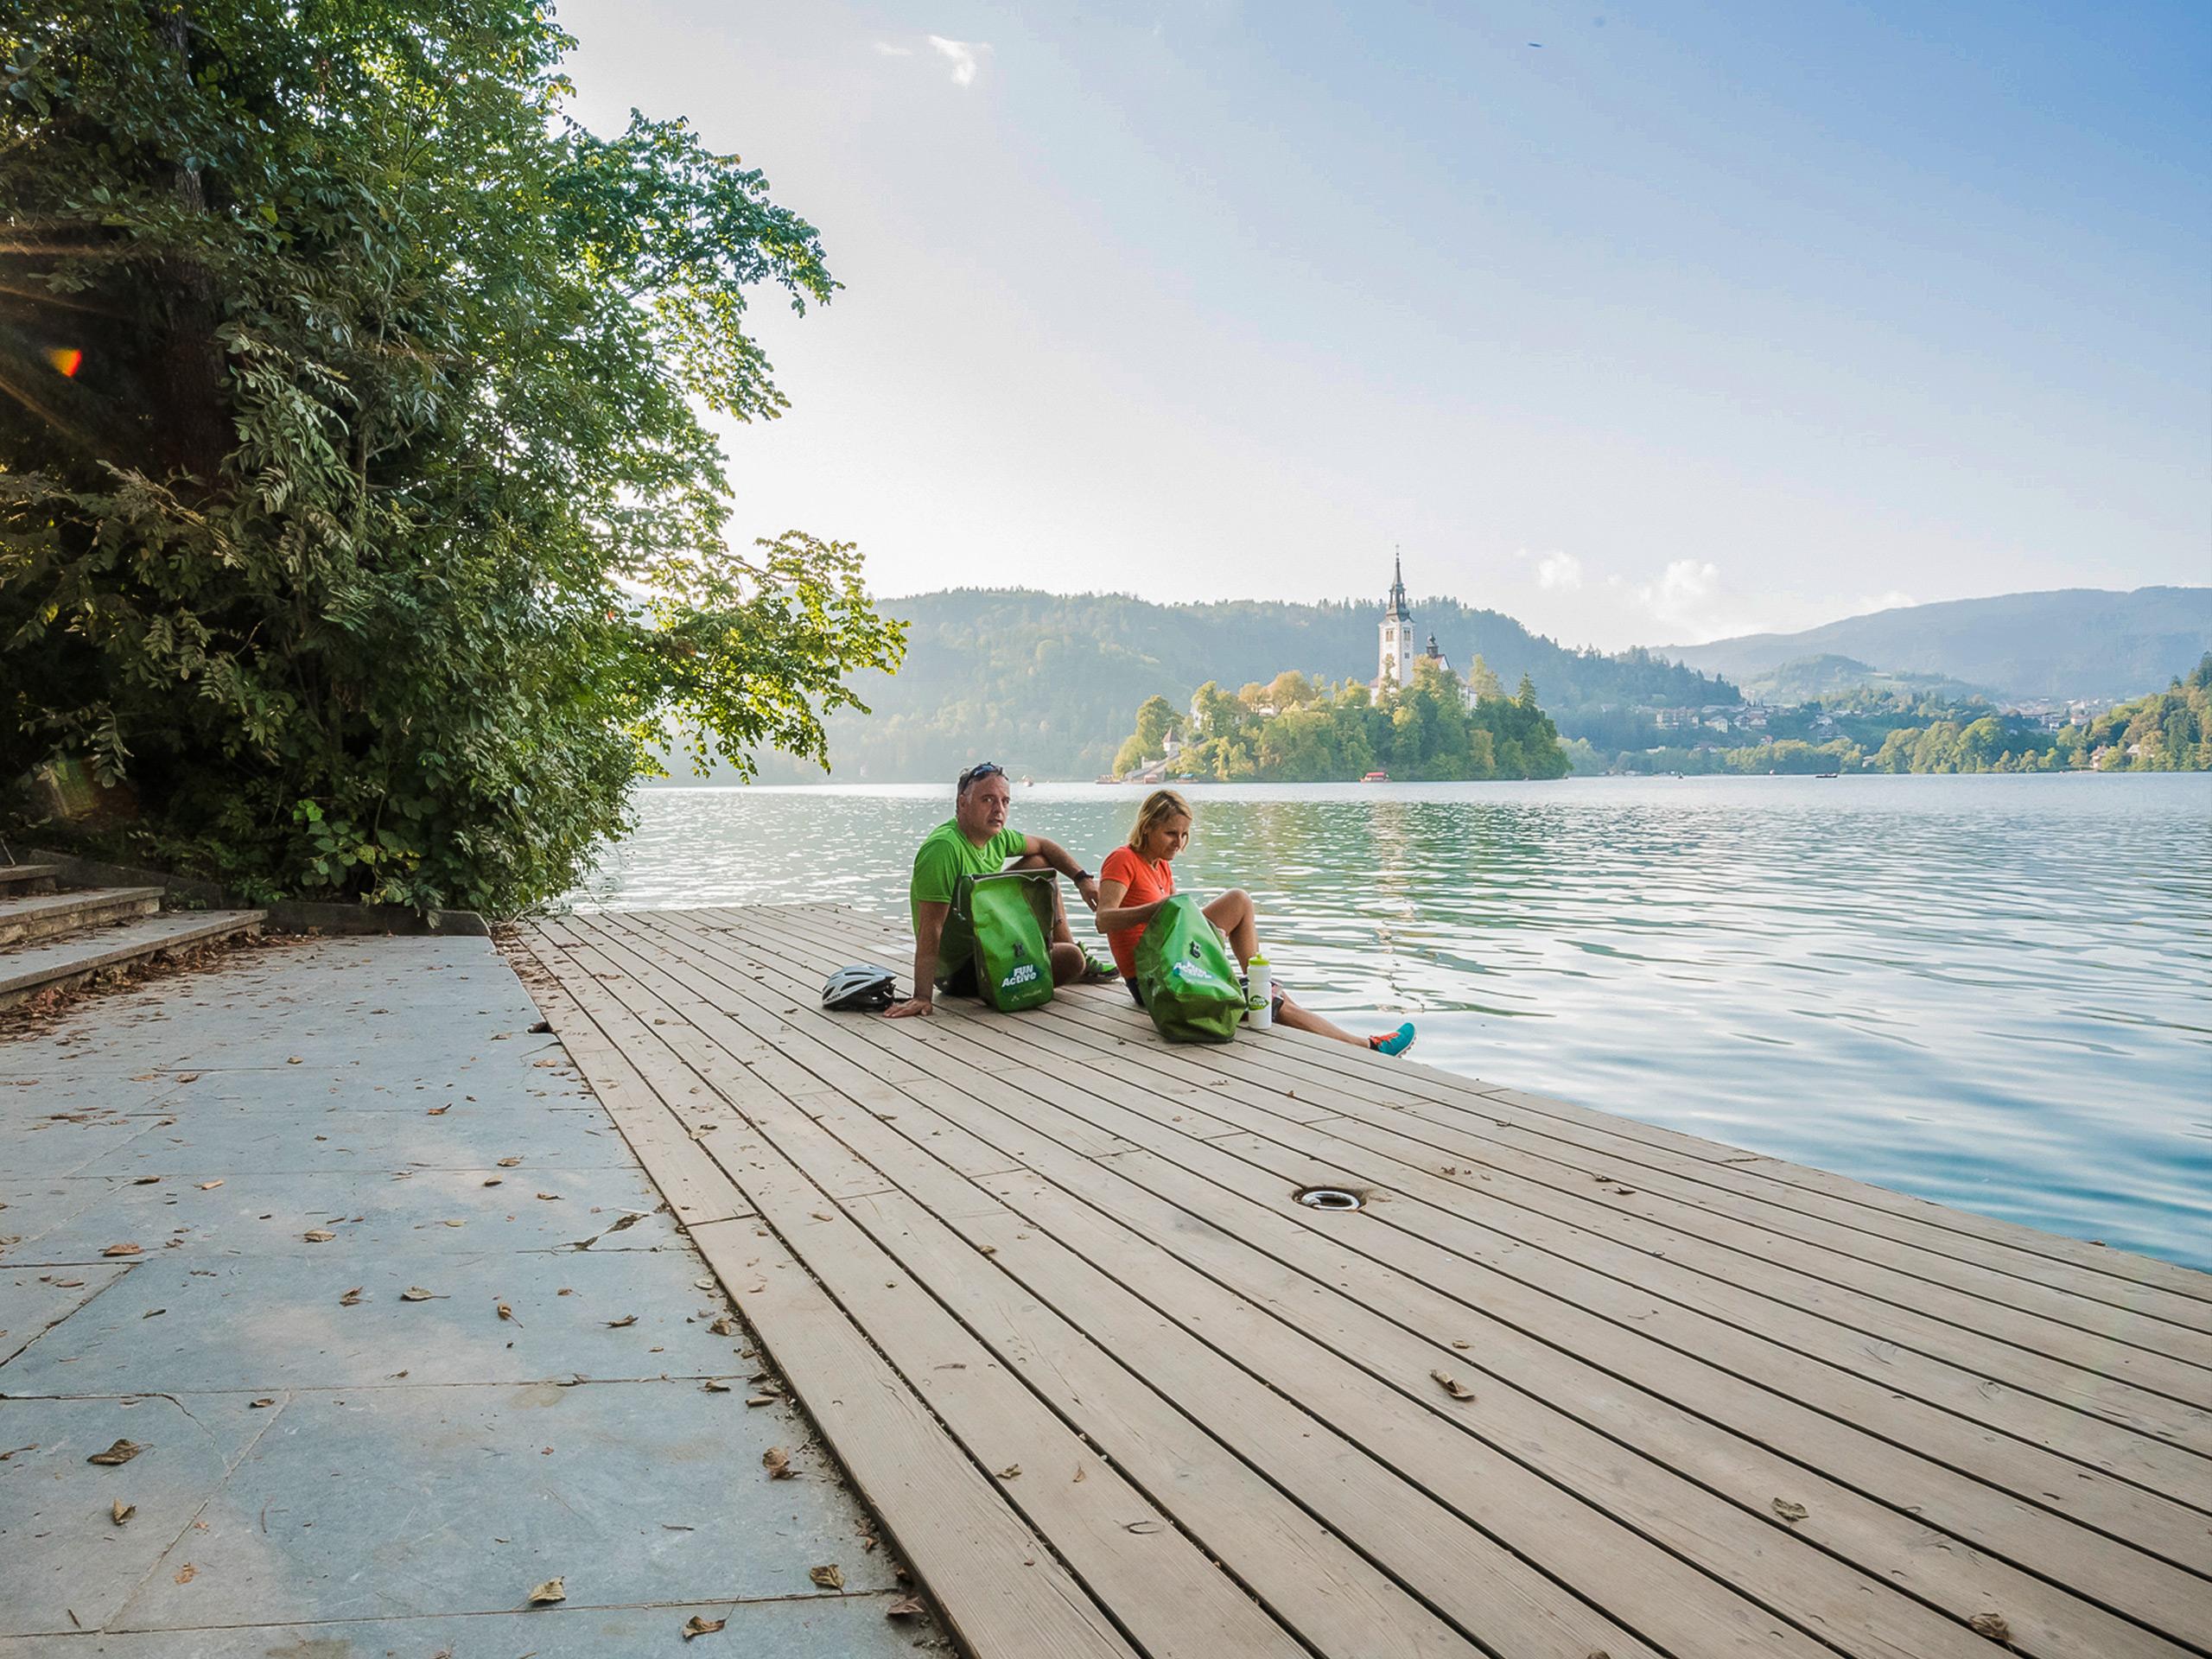 Tourists Enjoying the Views of Lake Bled